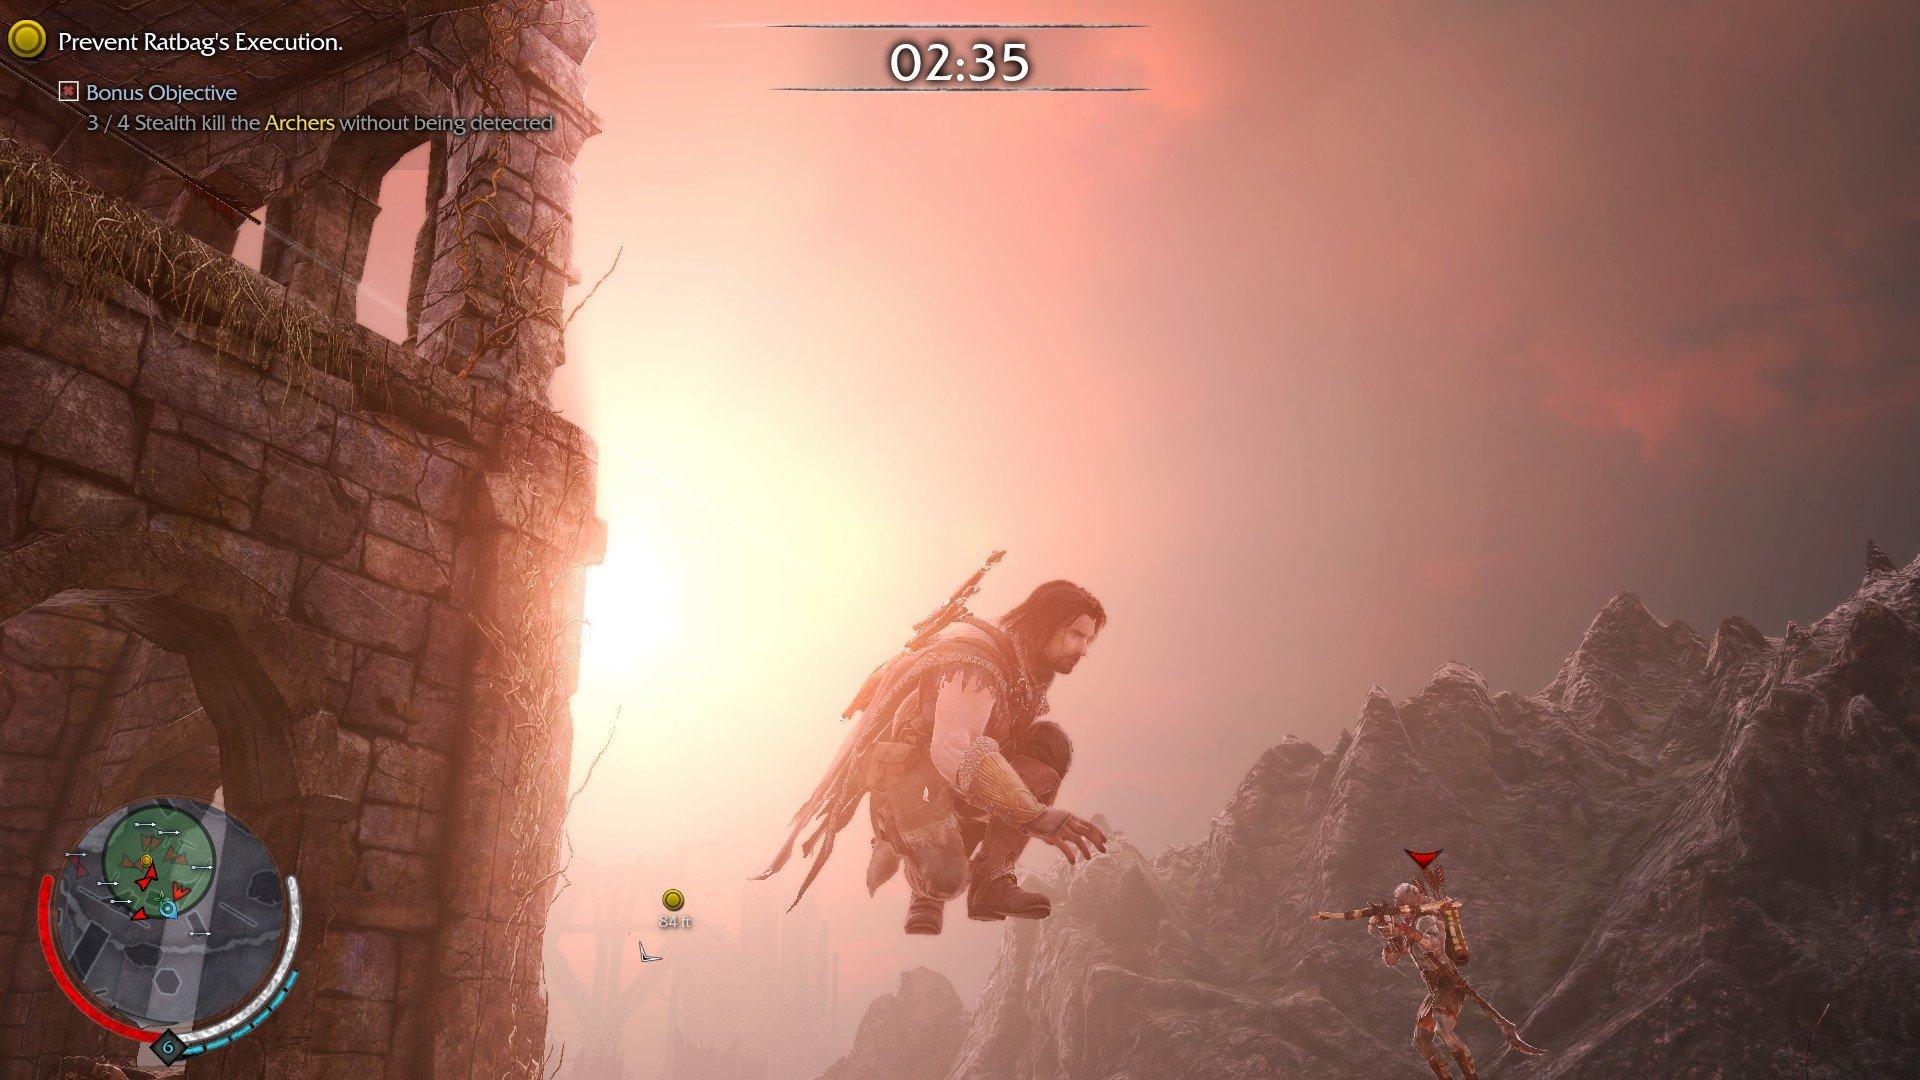 Сам себе Саурон. Рецензия на Middle-earth: Shadow of Mordor - Изображение 4